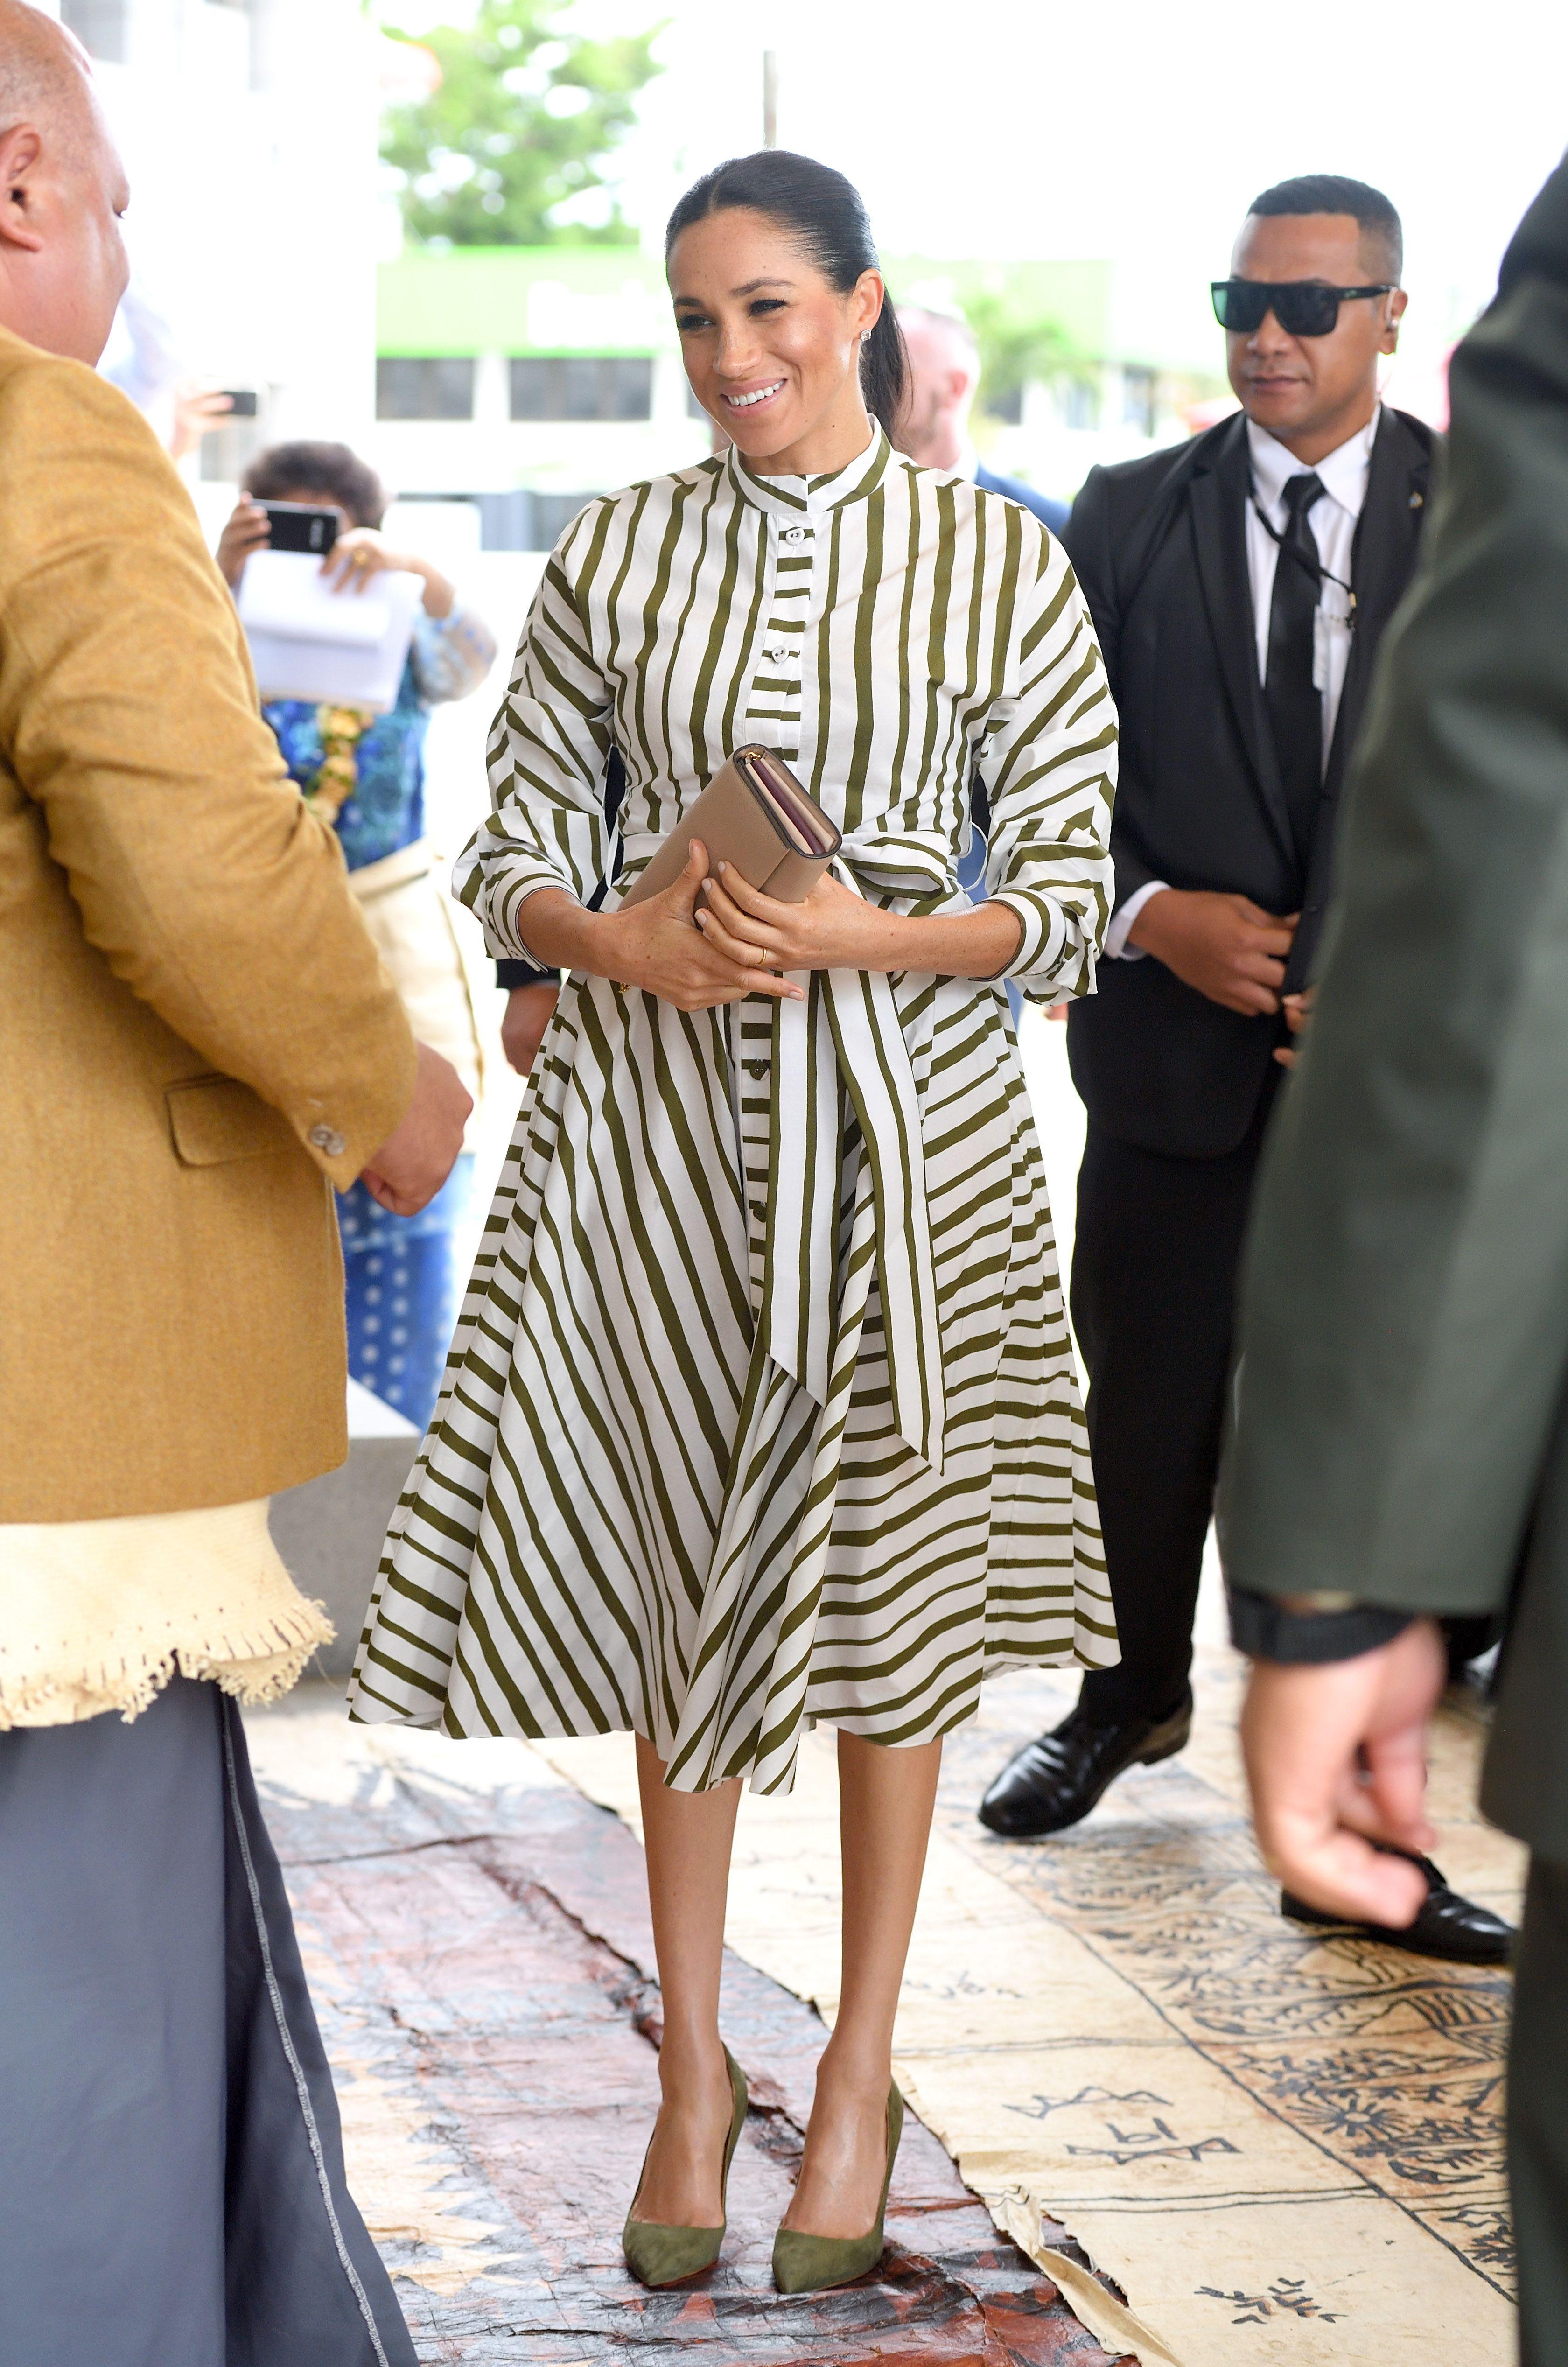 b7a198d9c74 Best Meghan Markle Pregnant Style Looks - Princess Meghan Maternity Fashion